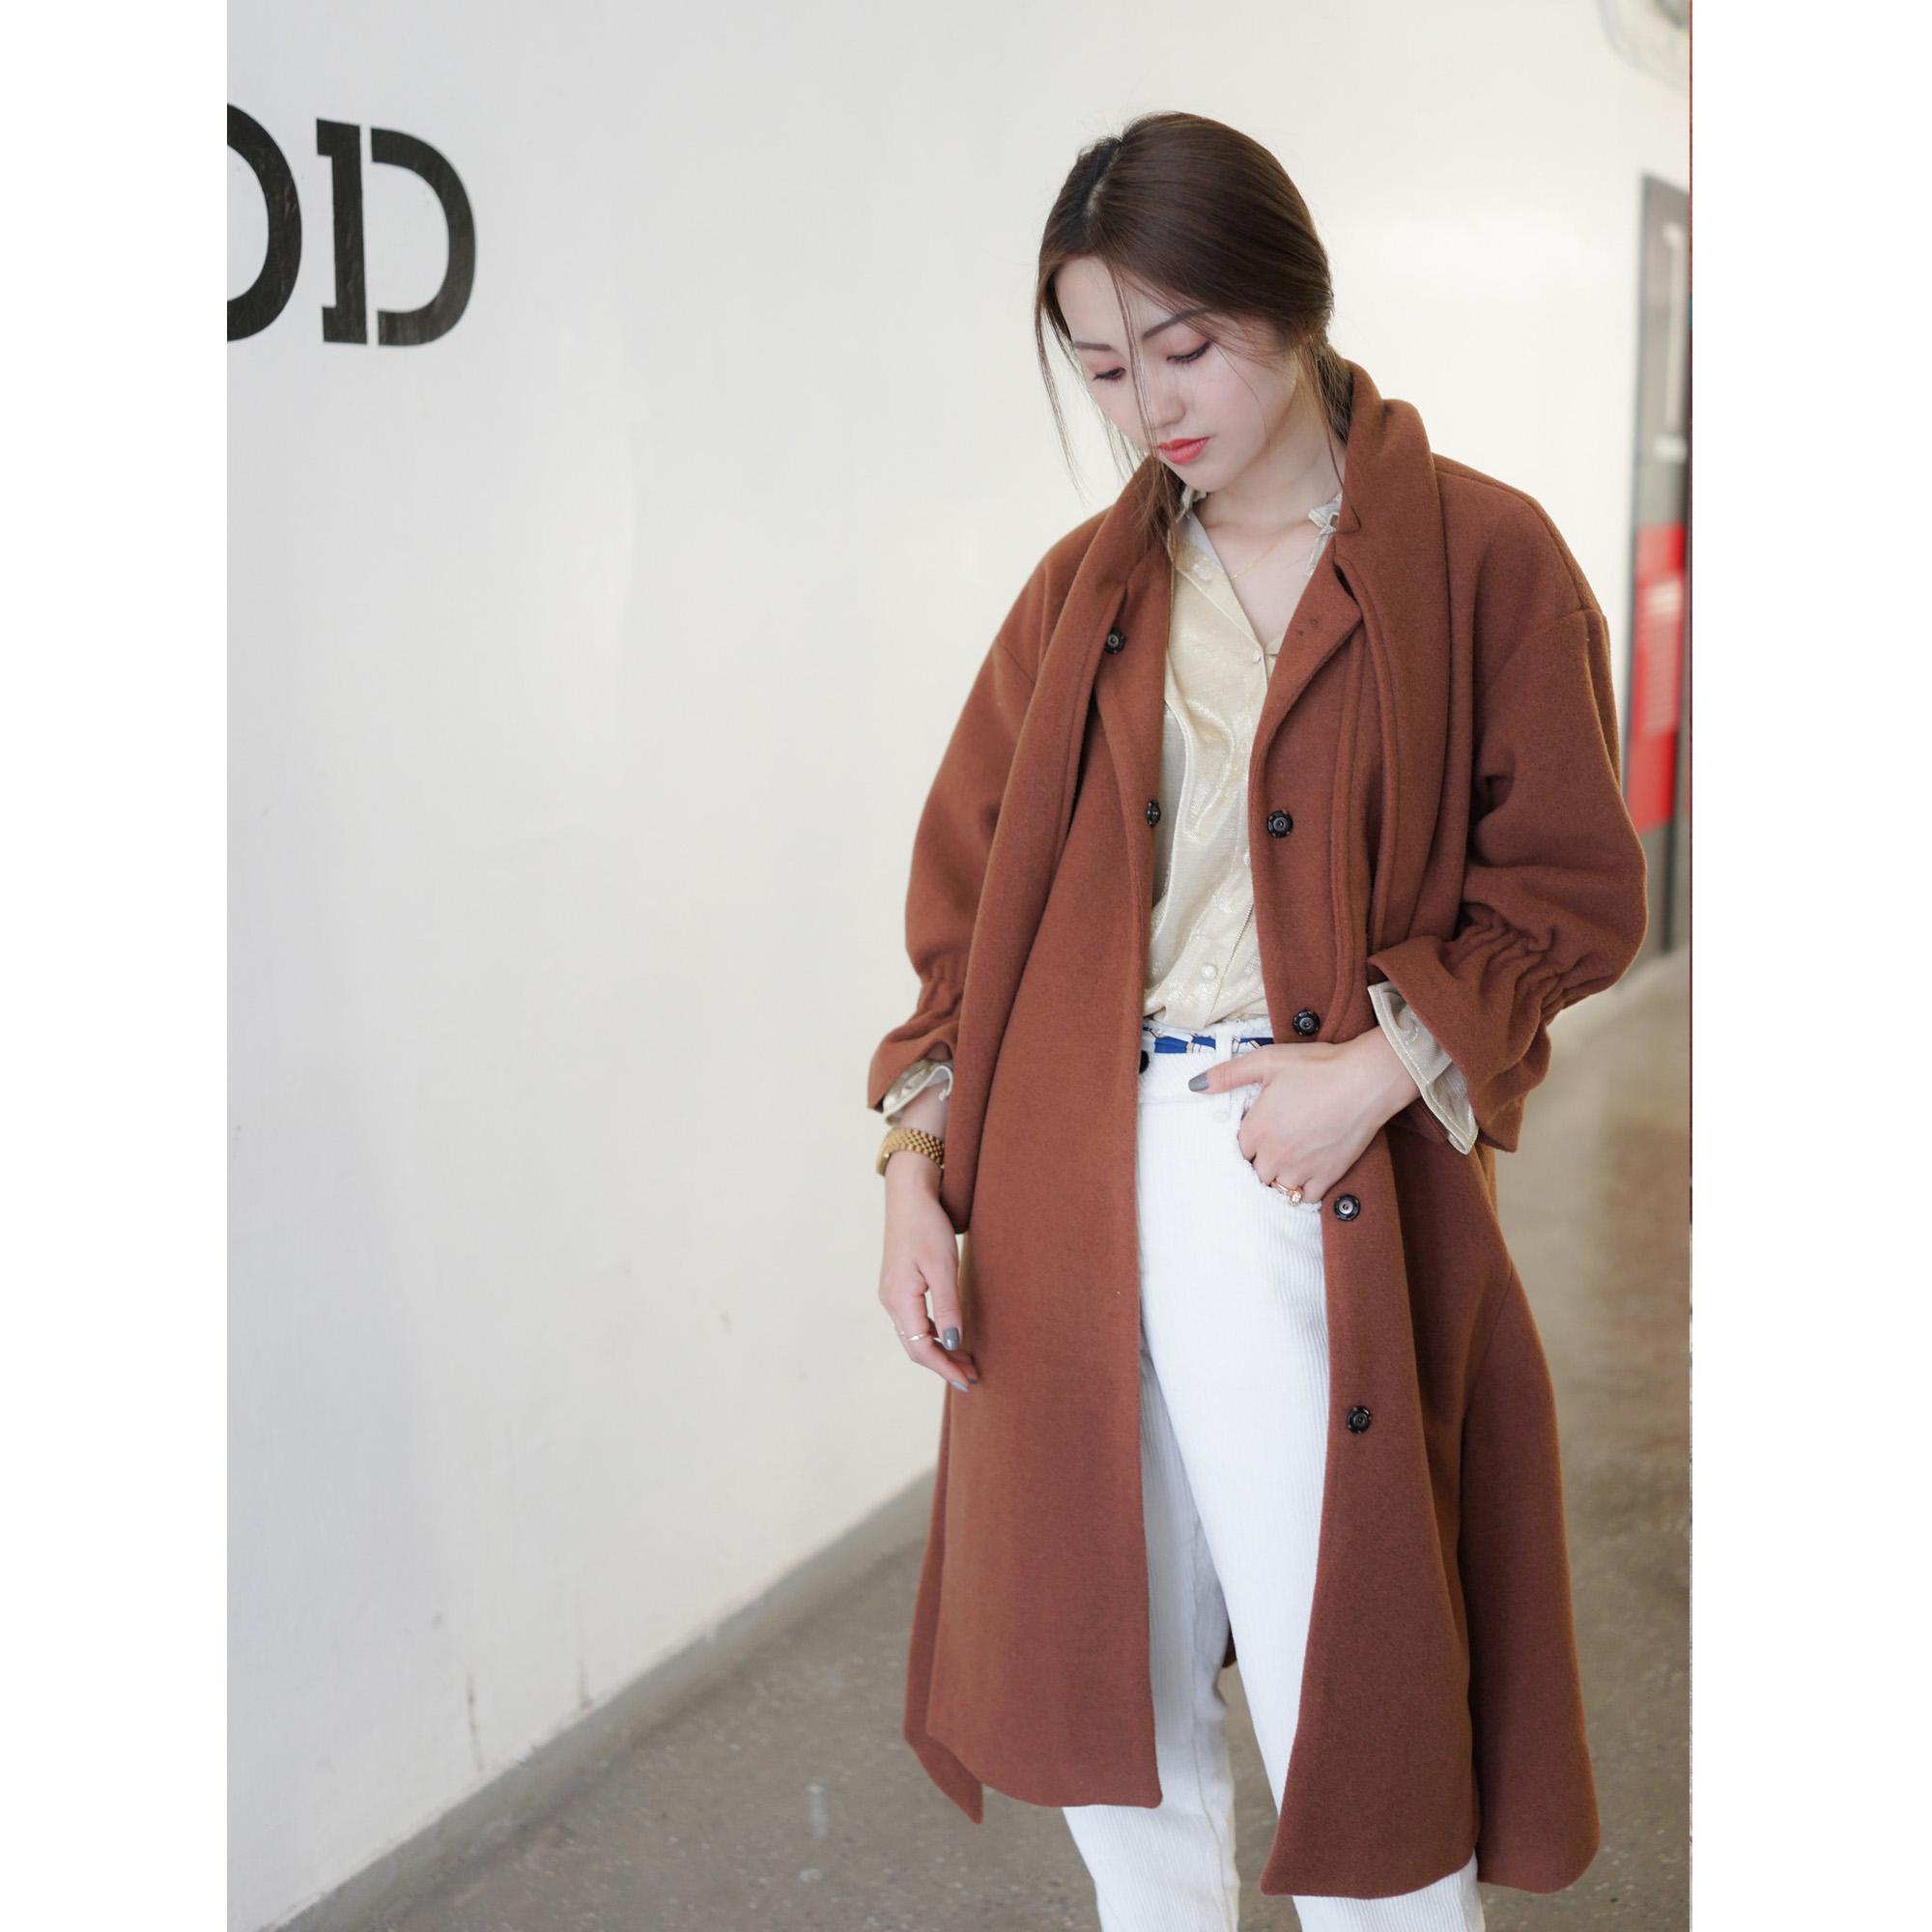 ONE GIRLS/冬季新款重磅推荐复古时髦花苞袖羊毛呢大衣女呢衣外套